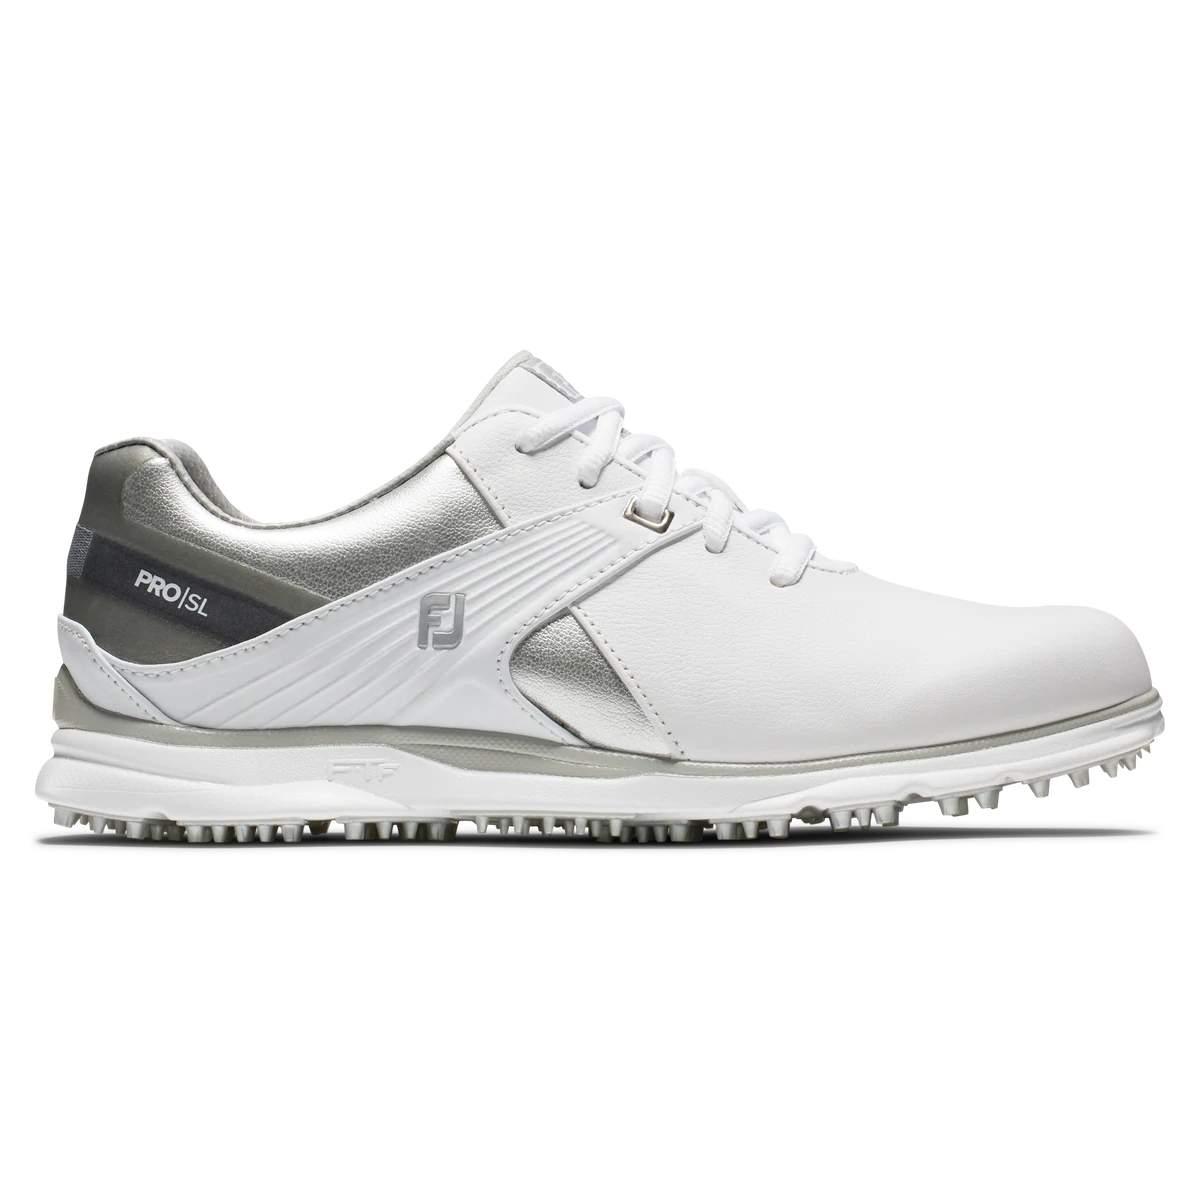 FootJoy Women's Pro|SL White Golf Shoe - Style 98114